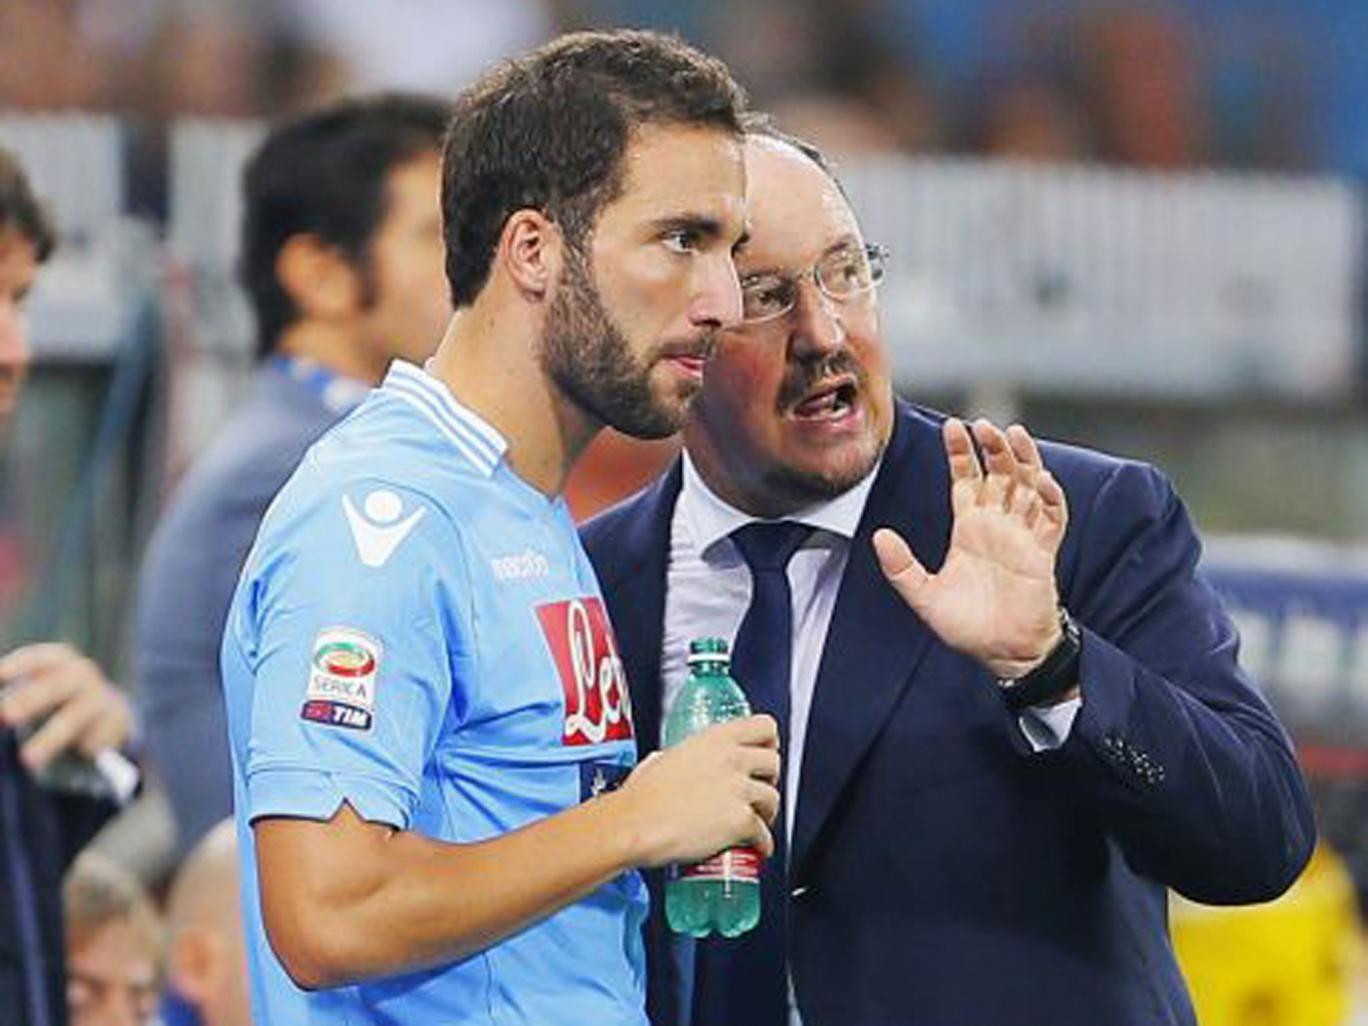 Gonzalo Higuain speaks with his manager at Napoli Rafa Benitez